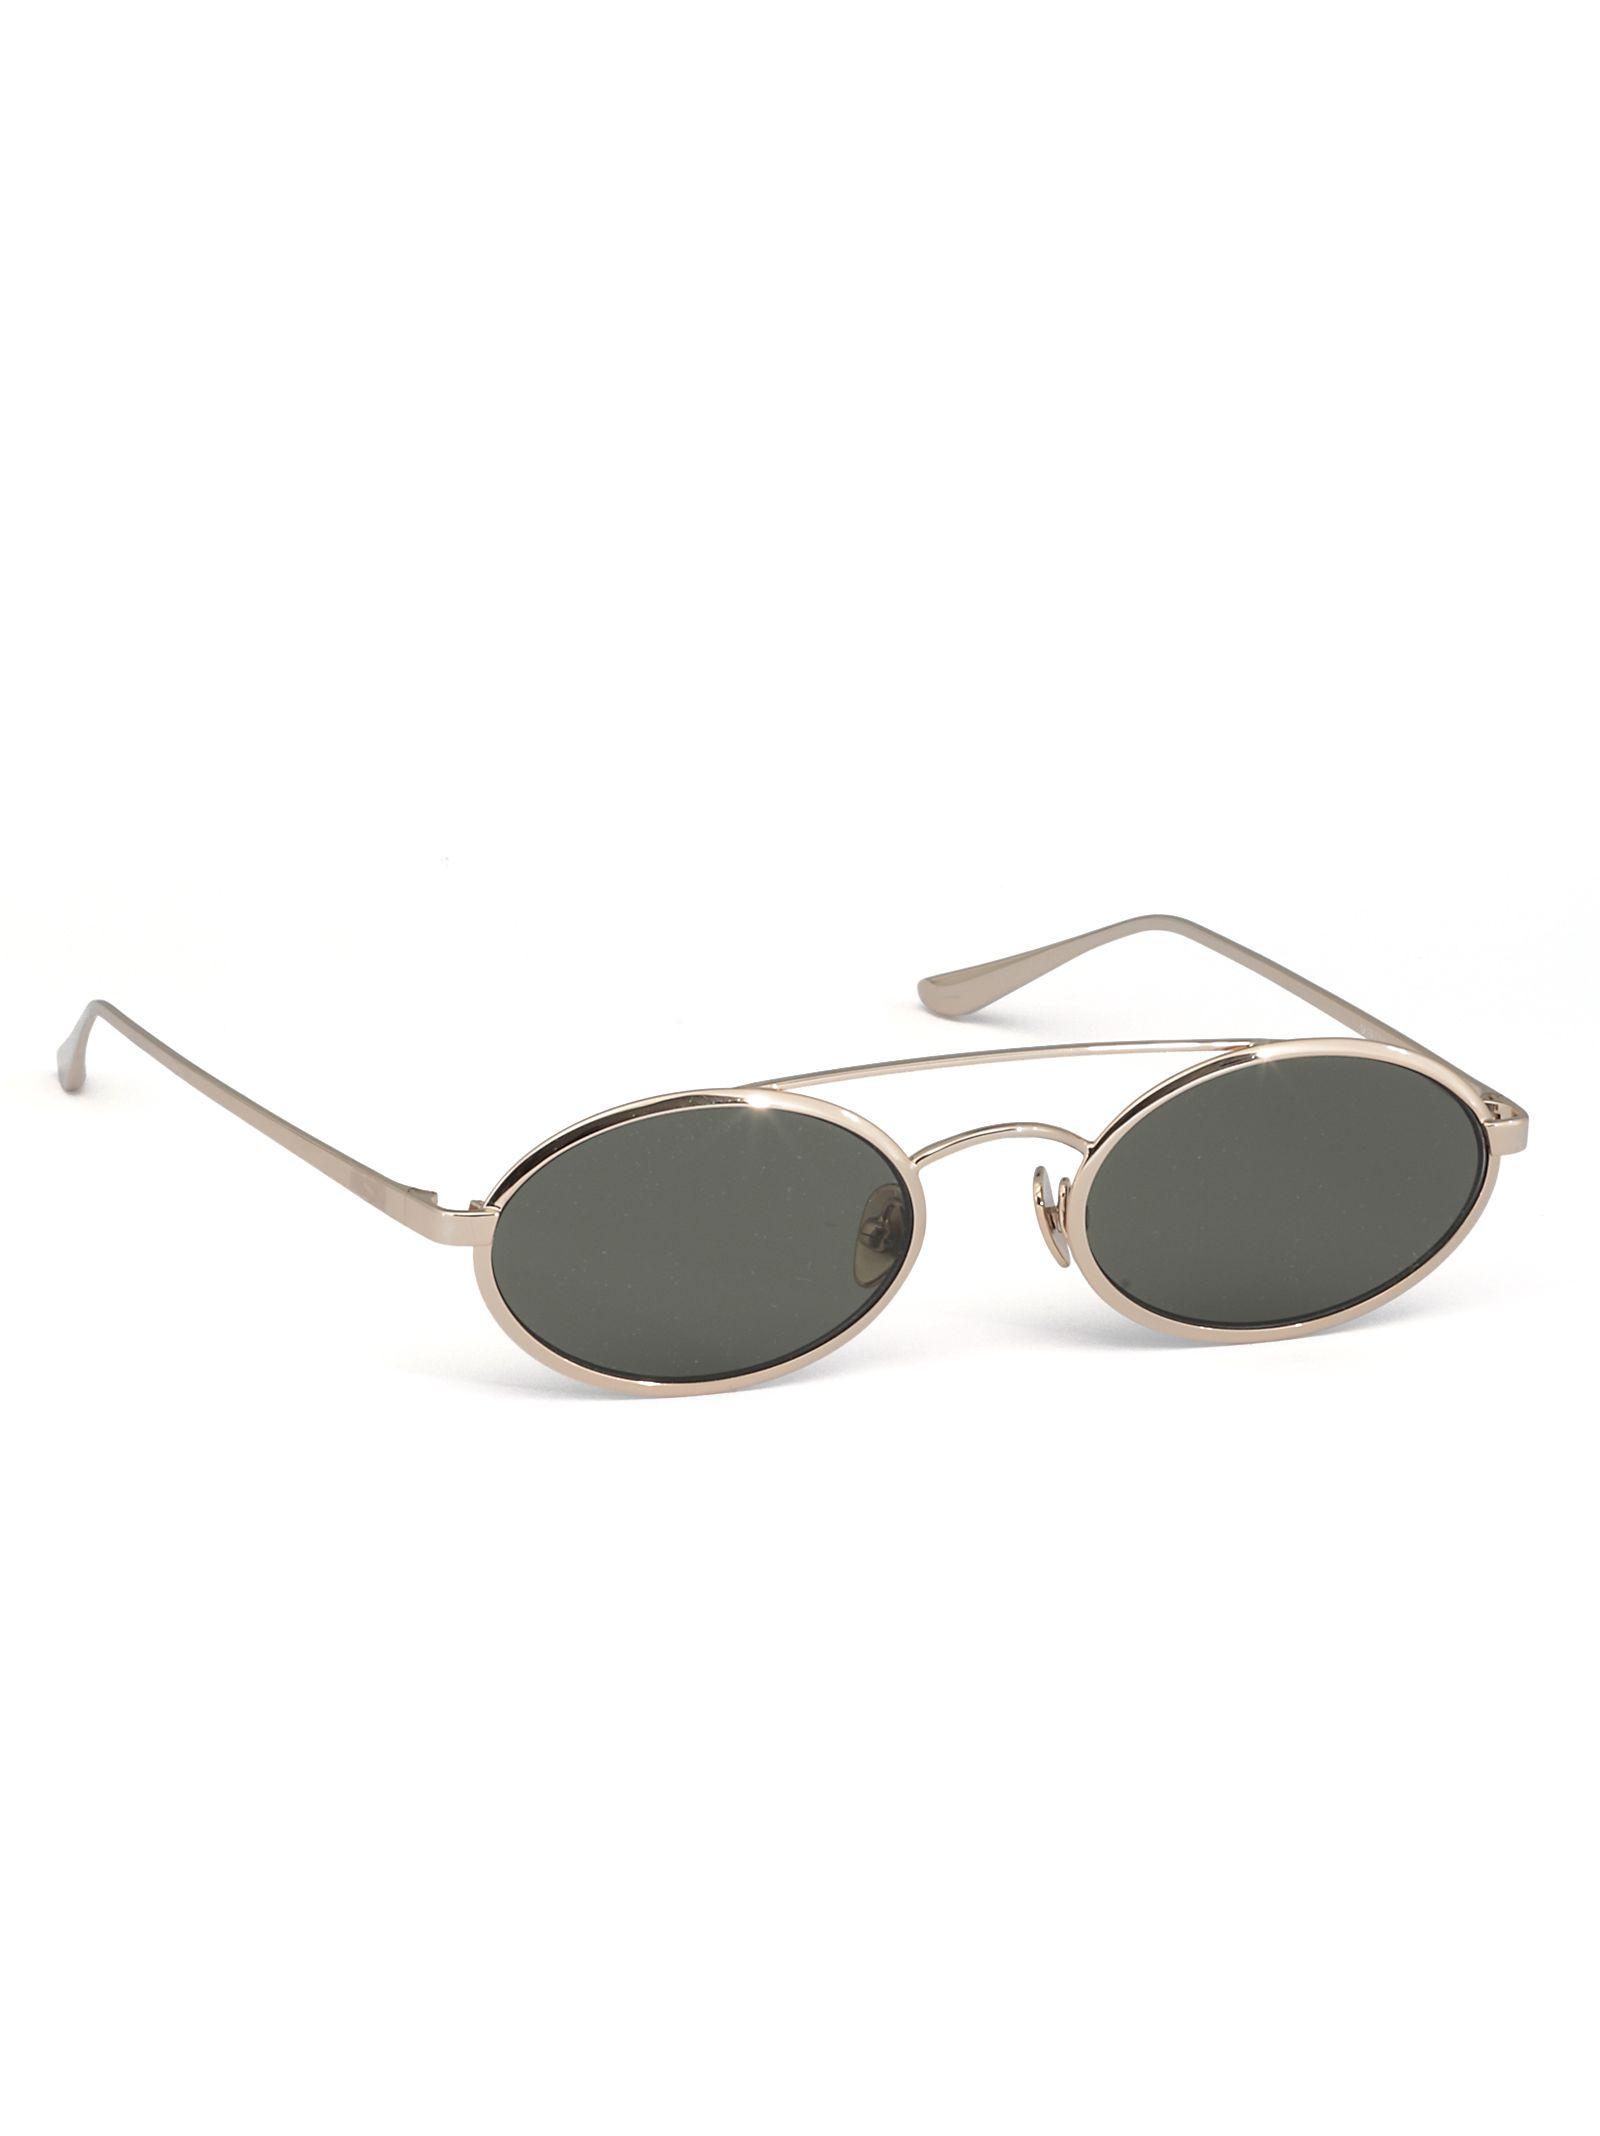 Self-Portrait Sunglasses LAYLA SUNGLASSES